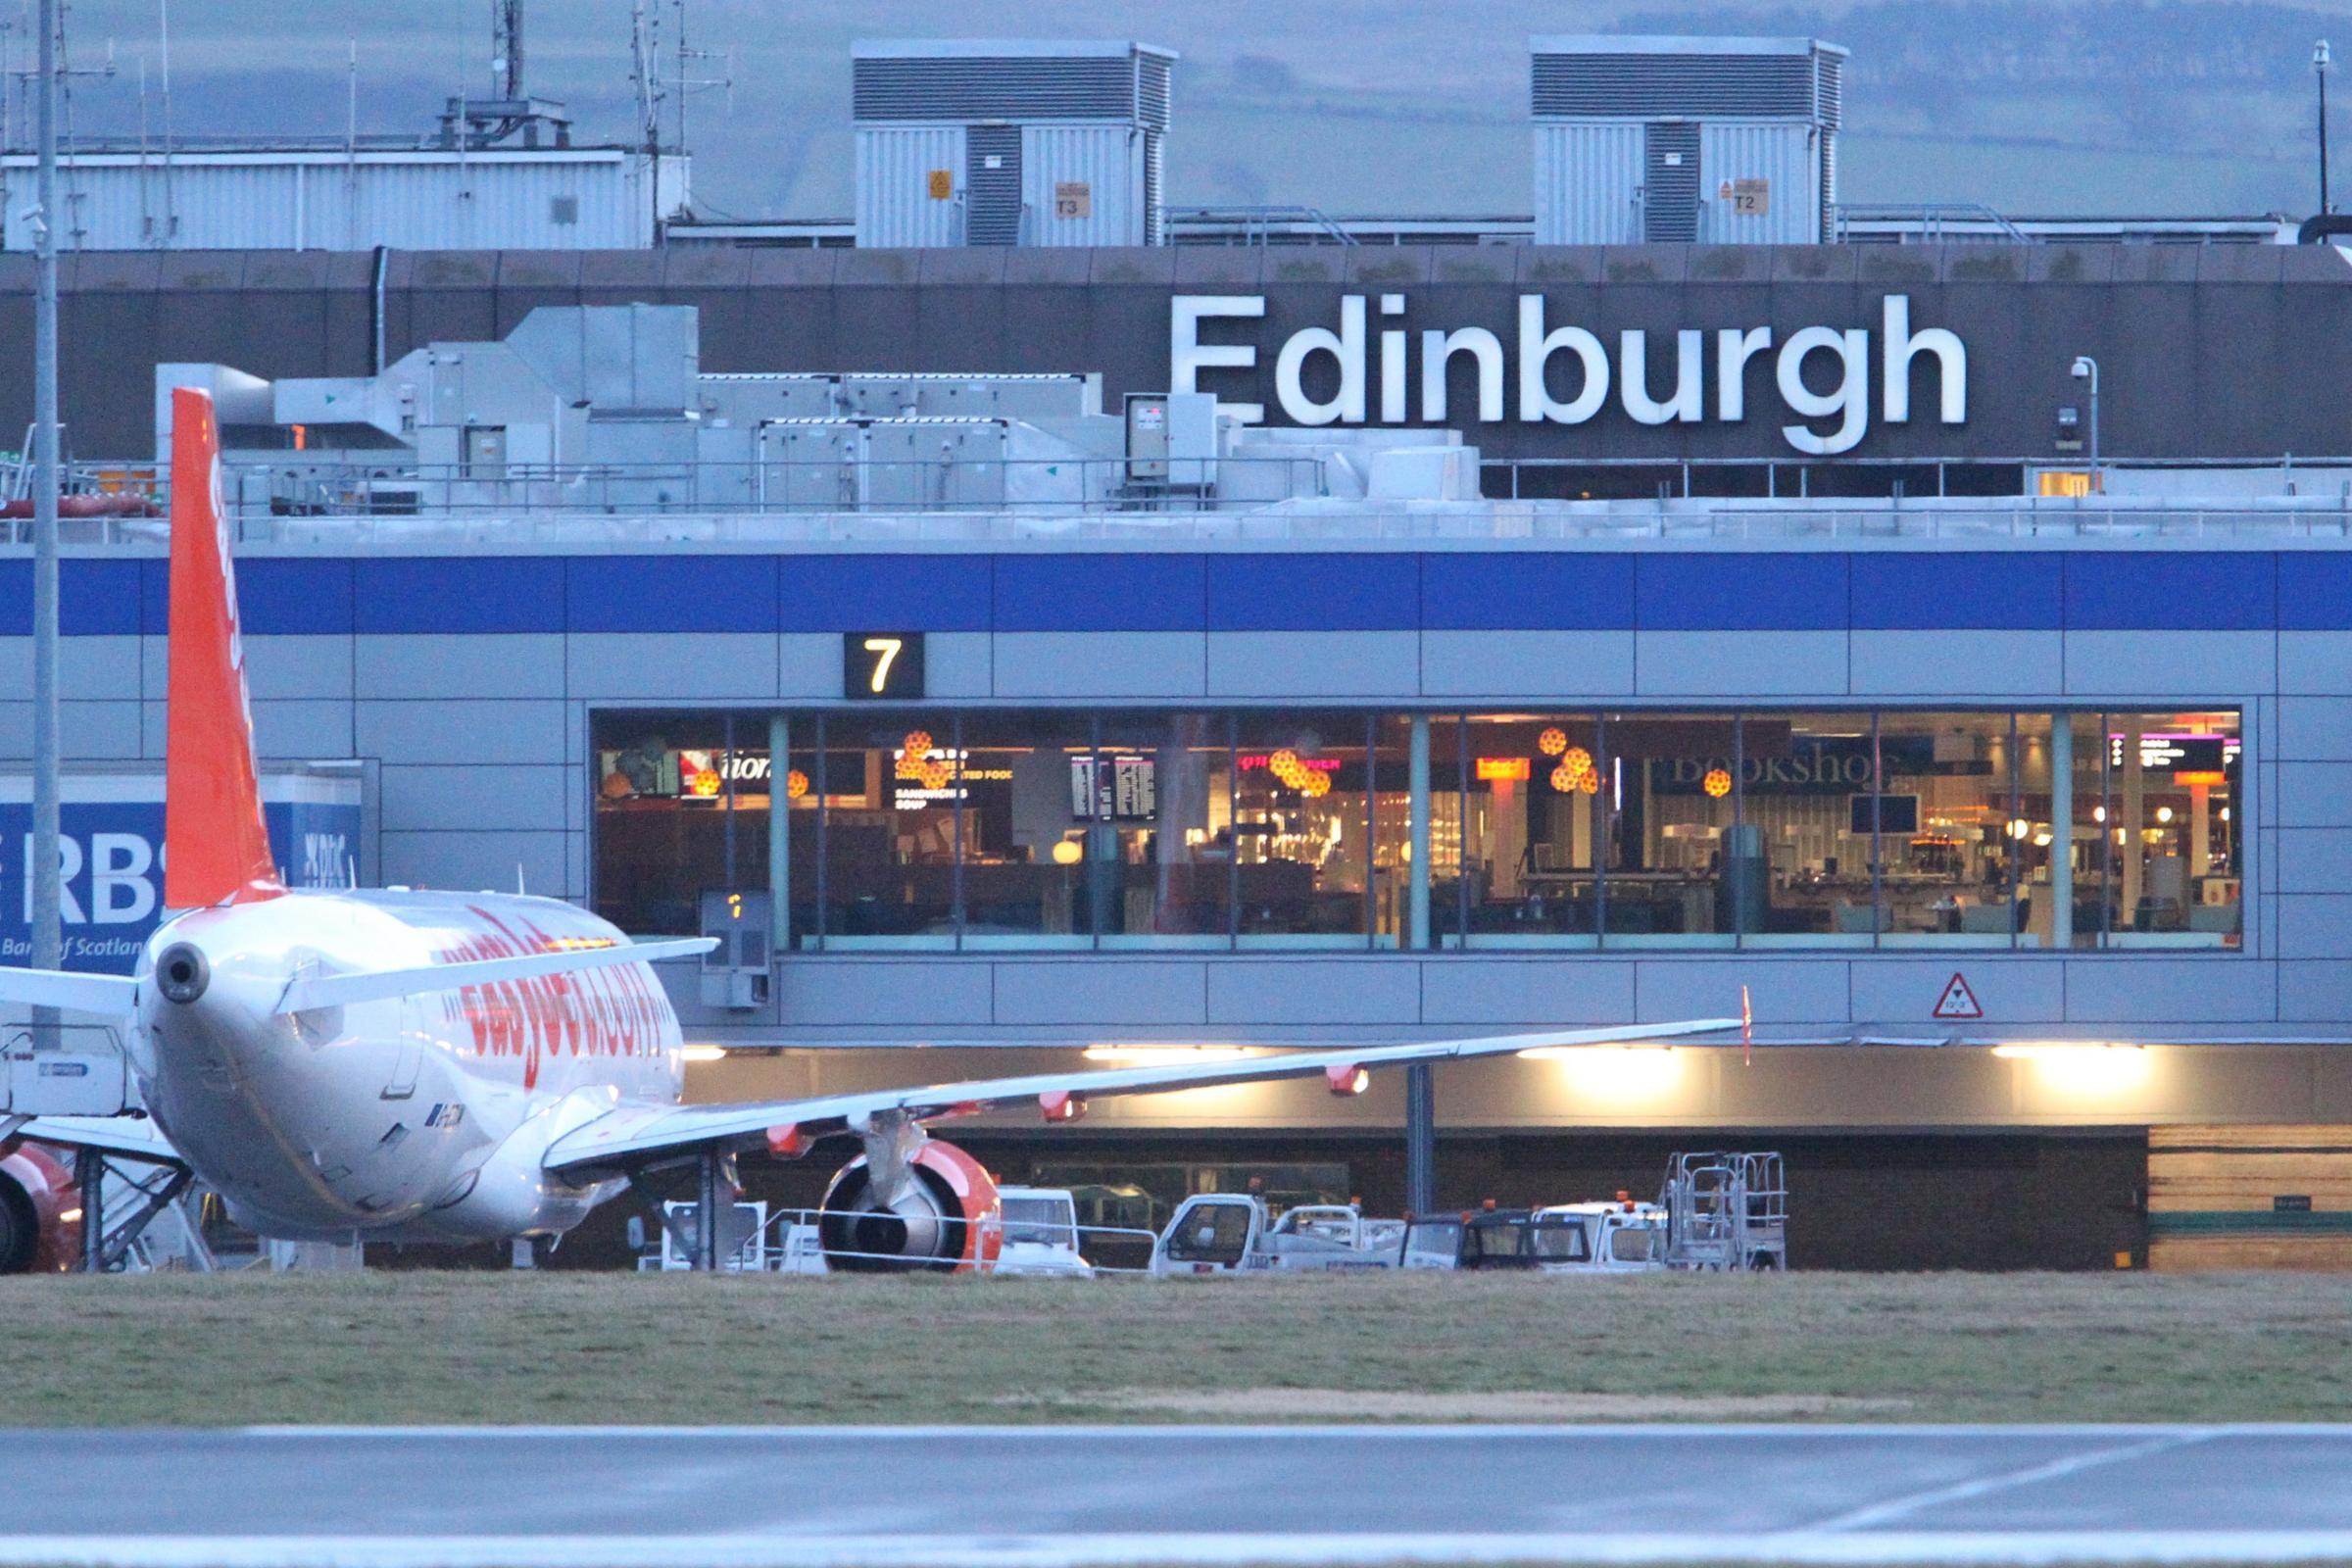 Edinburgh_Airpor